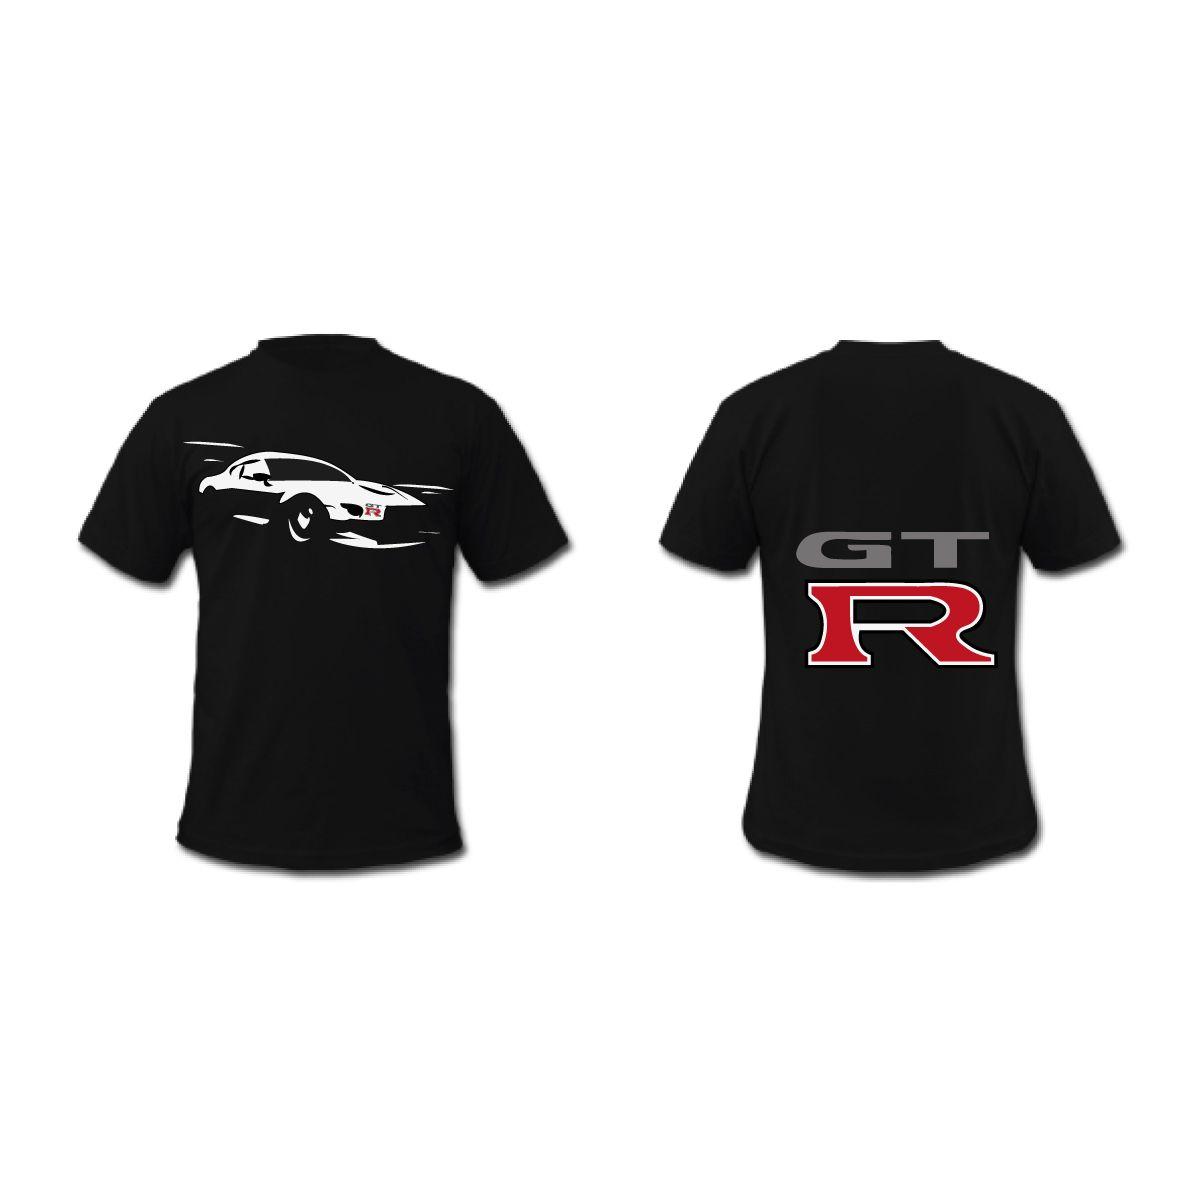 T Shirt Design For Gtr By Arunpoochi T Shirt Tshirtdesign Design